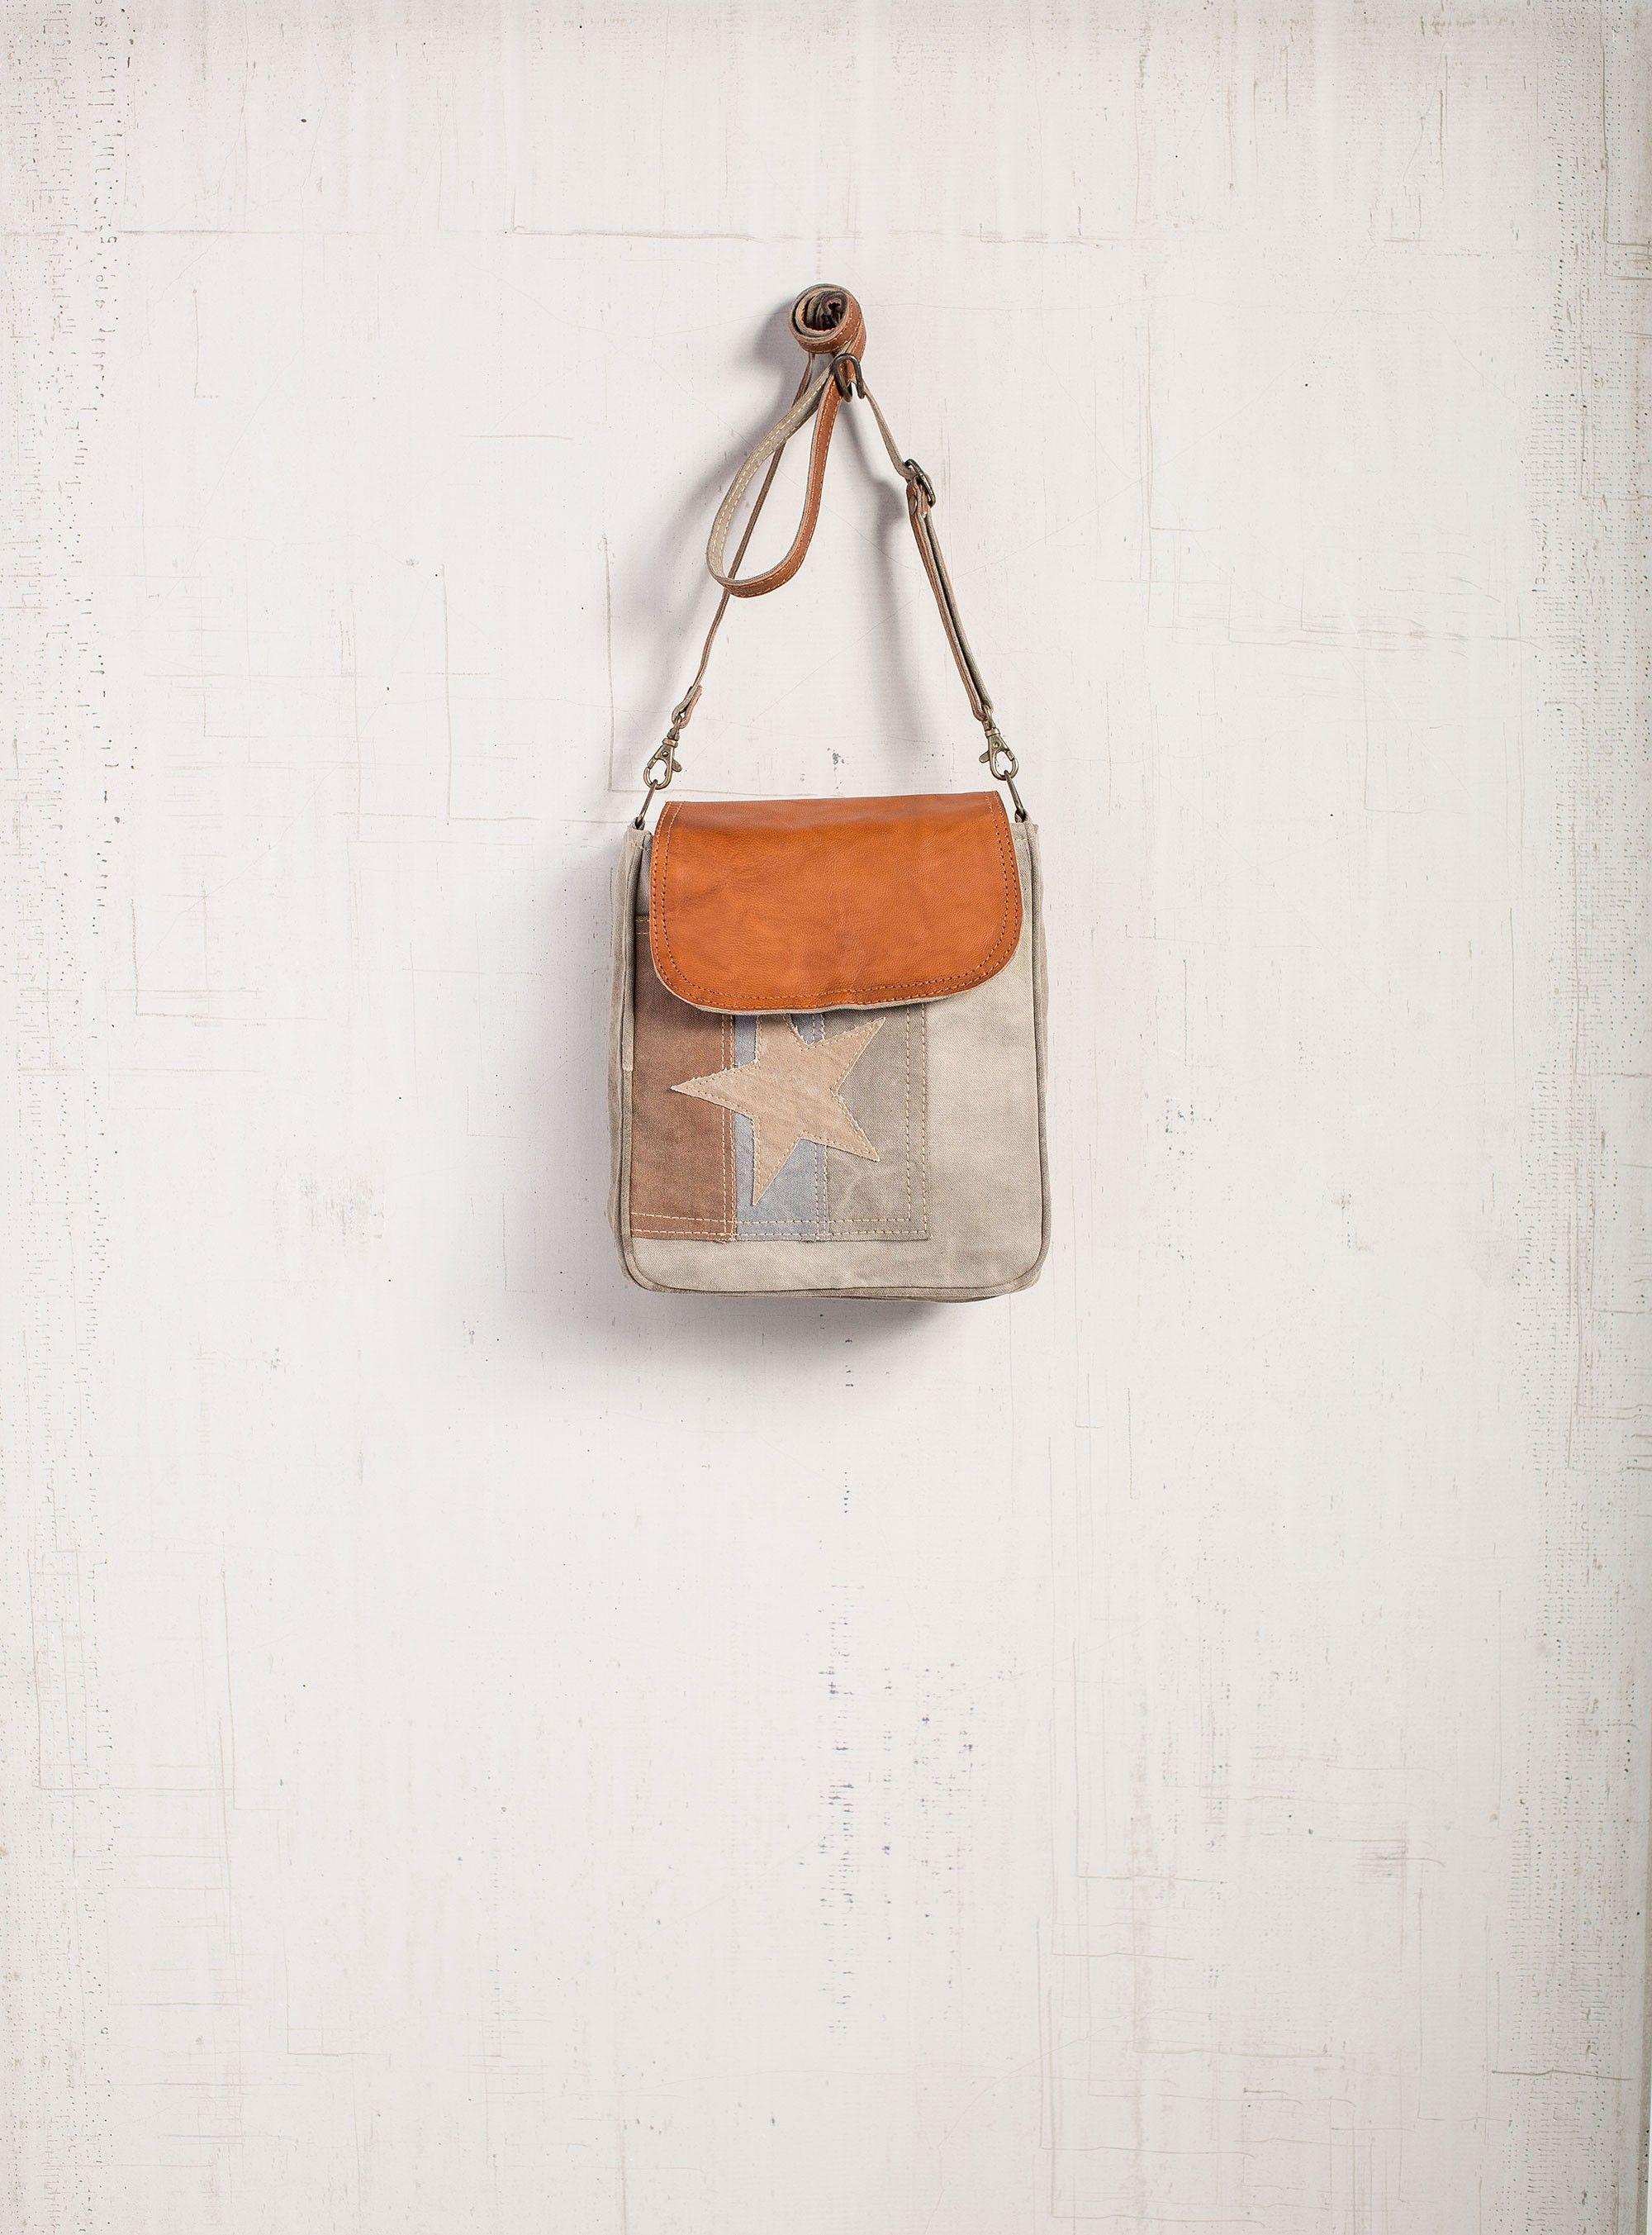 San Antonio bag via The Painted Fox